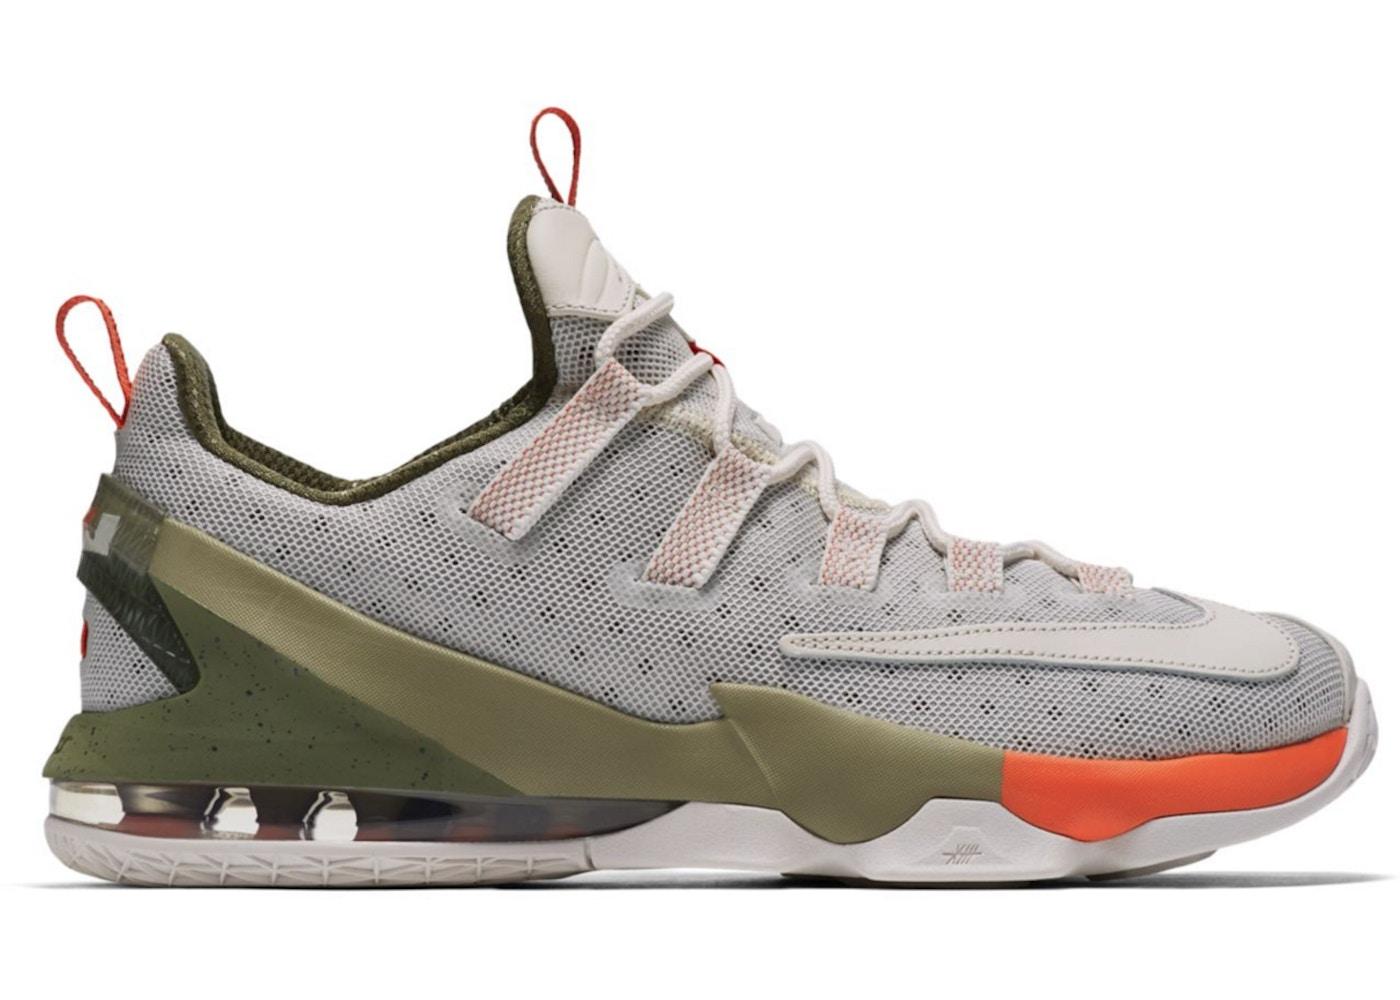 Buy Nike LeBron 13 Shoes & Deadstock Sneakers